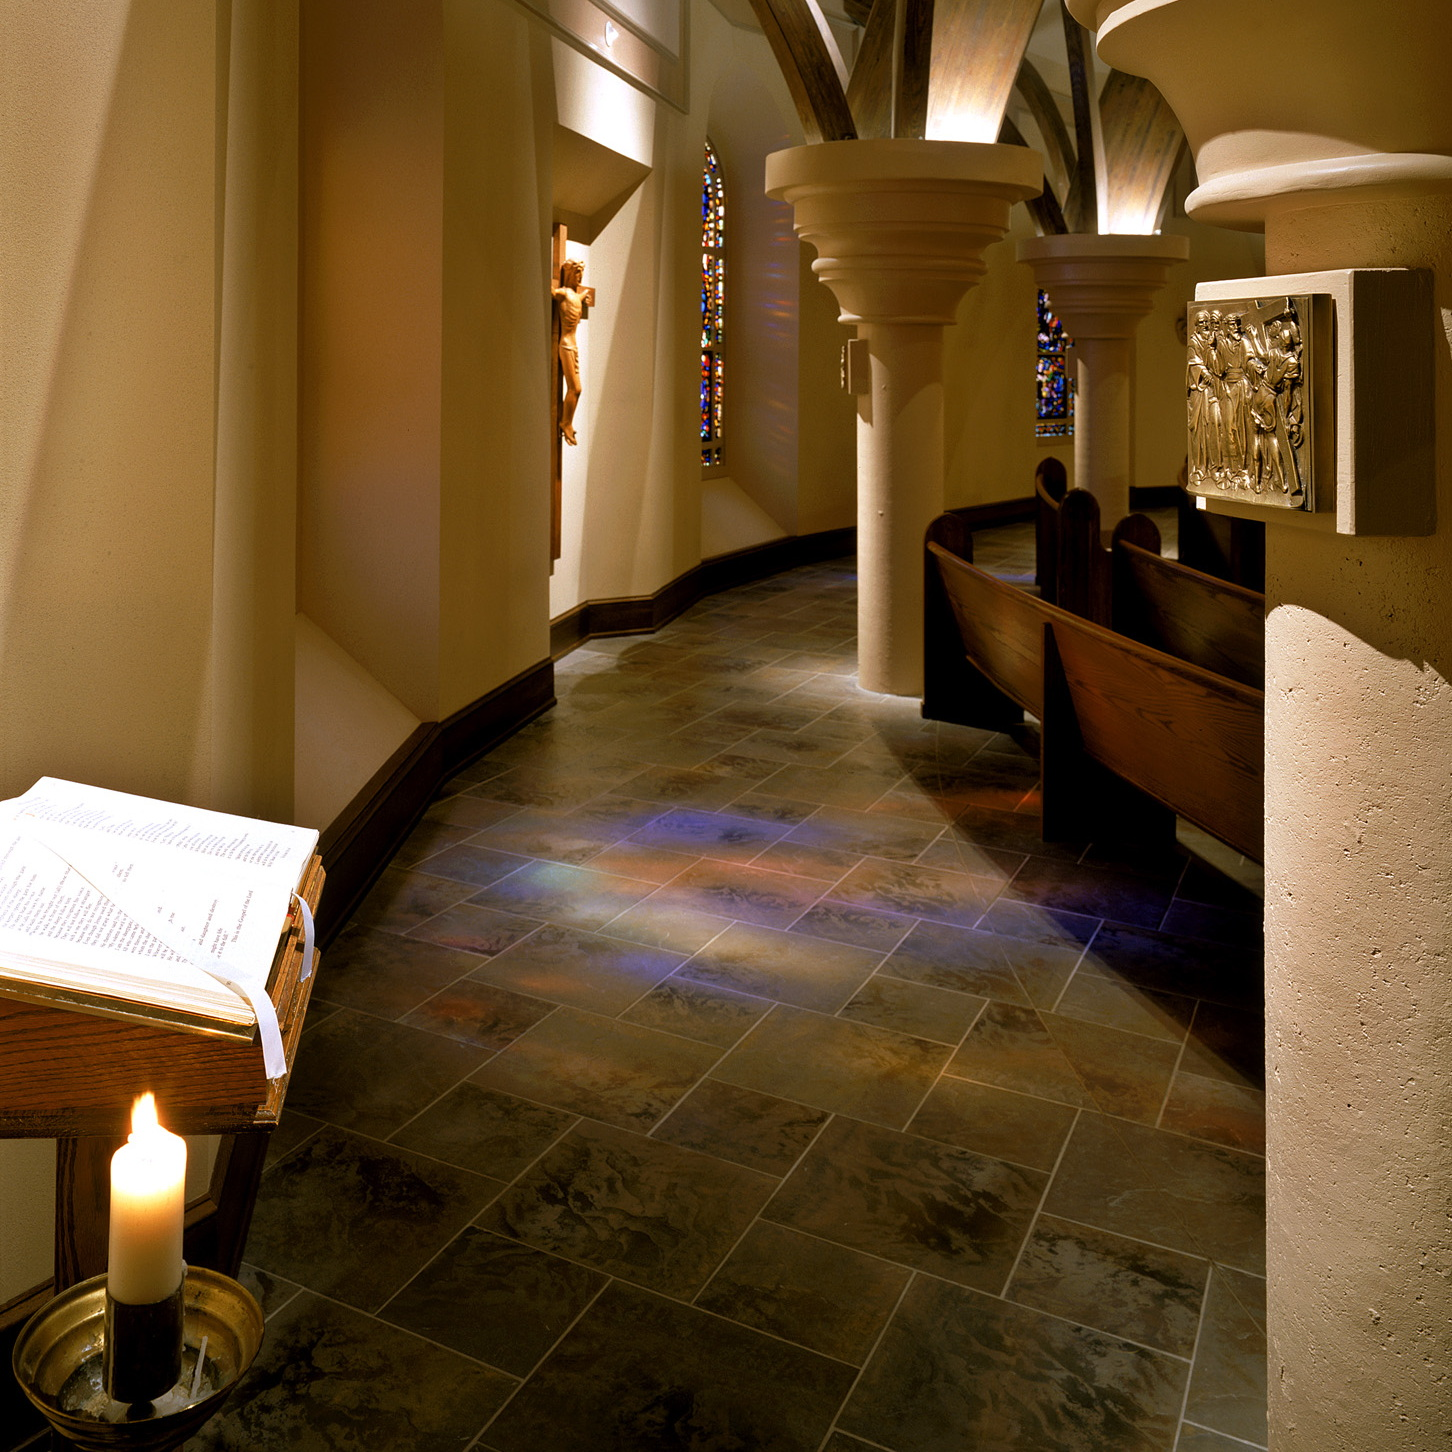 Church renovations, Catholic churches, new churches, chapels, worship spaces, liturgical design